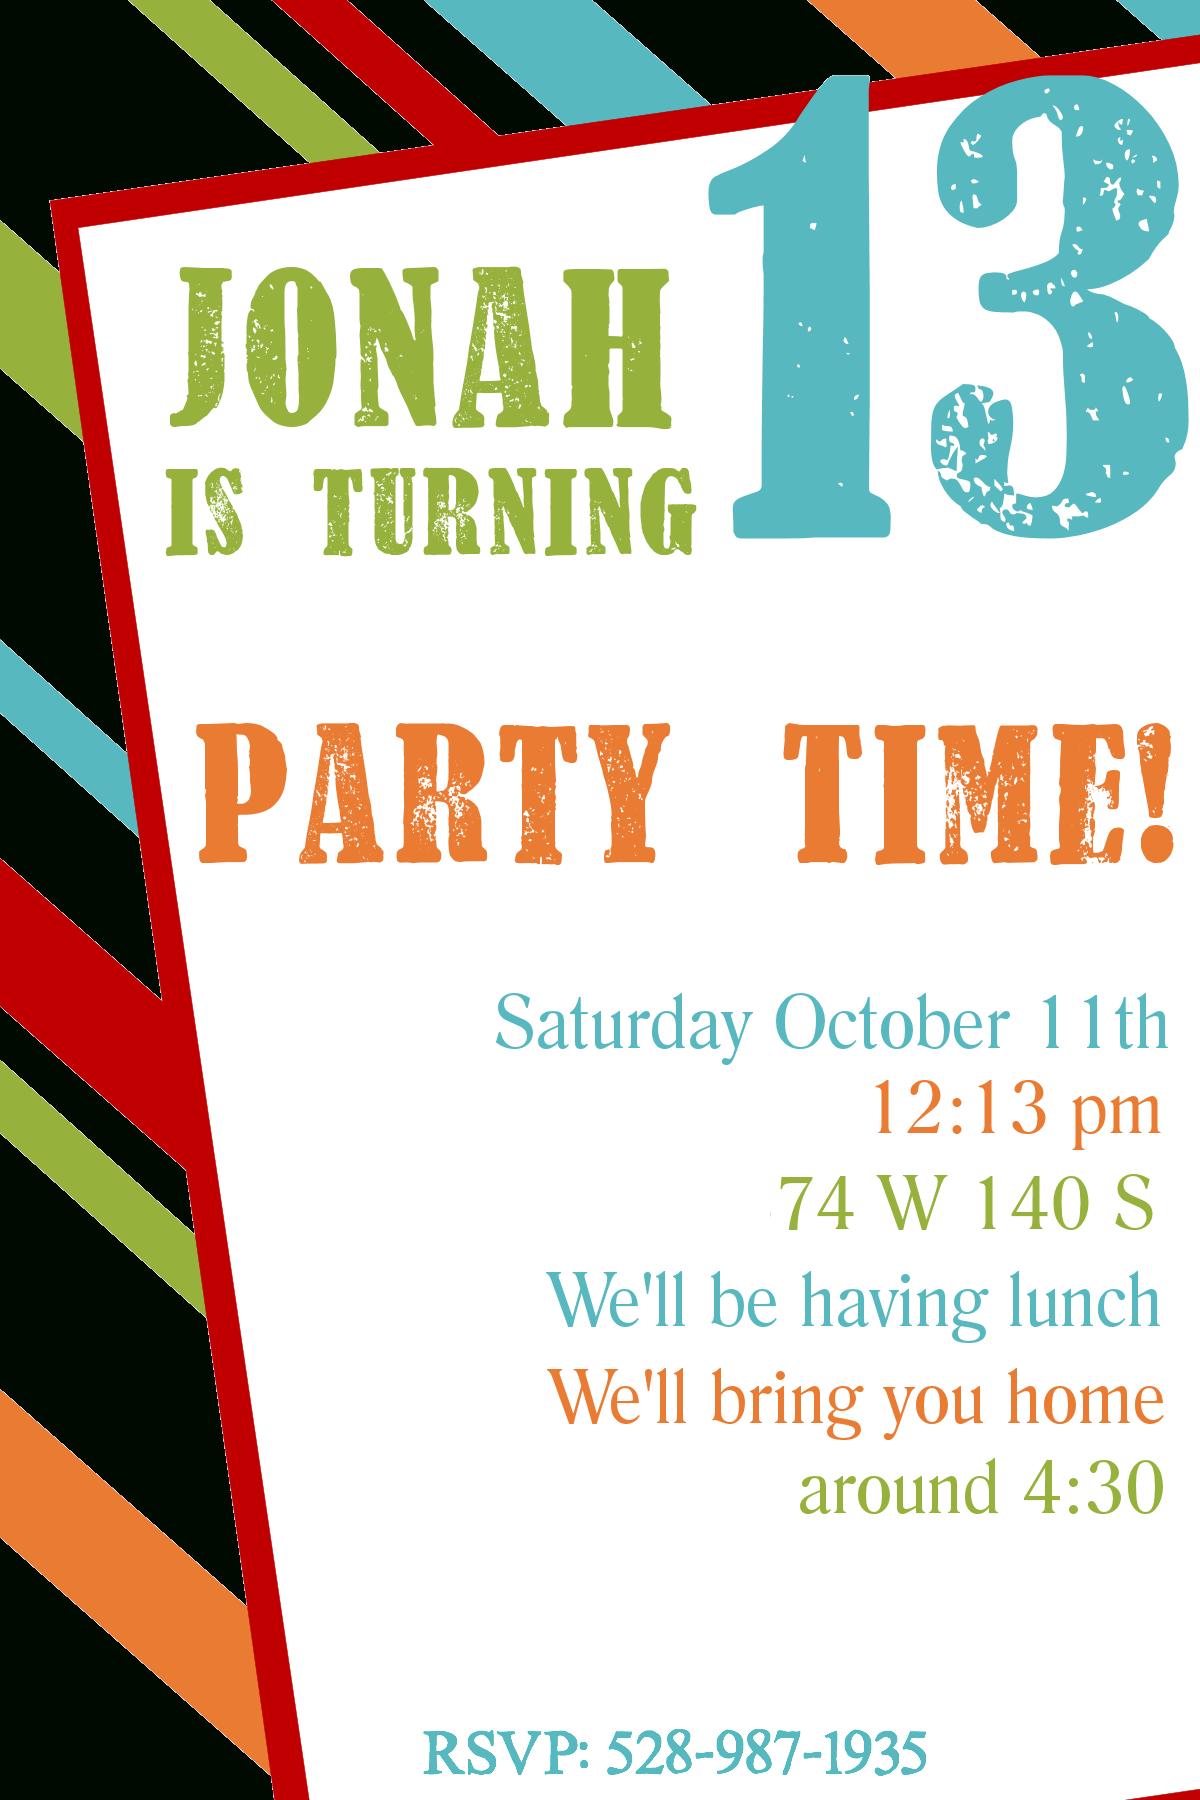 Free Boy Birthday Invitation Templates - Demir.iso-Consulting.co - 21St Birthday Invitation Templates Free Printable